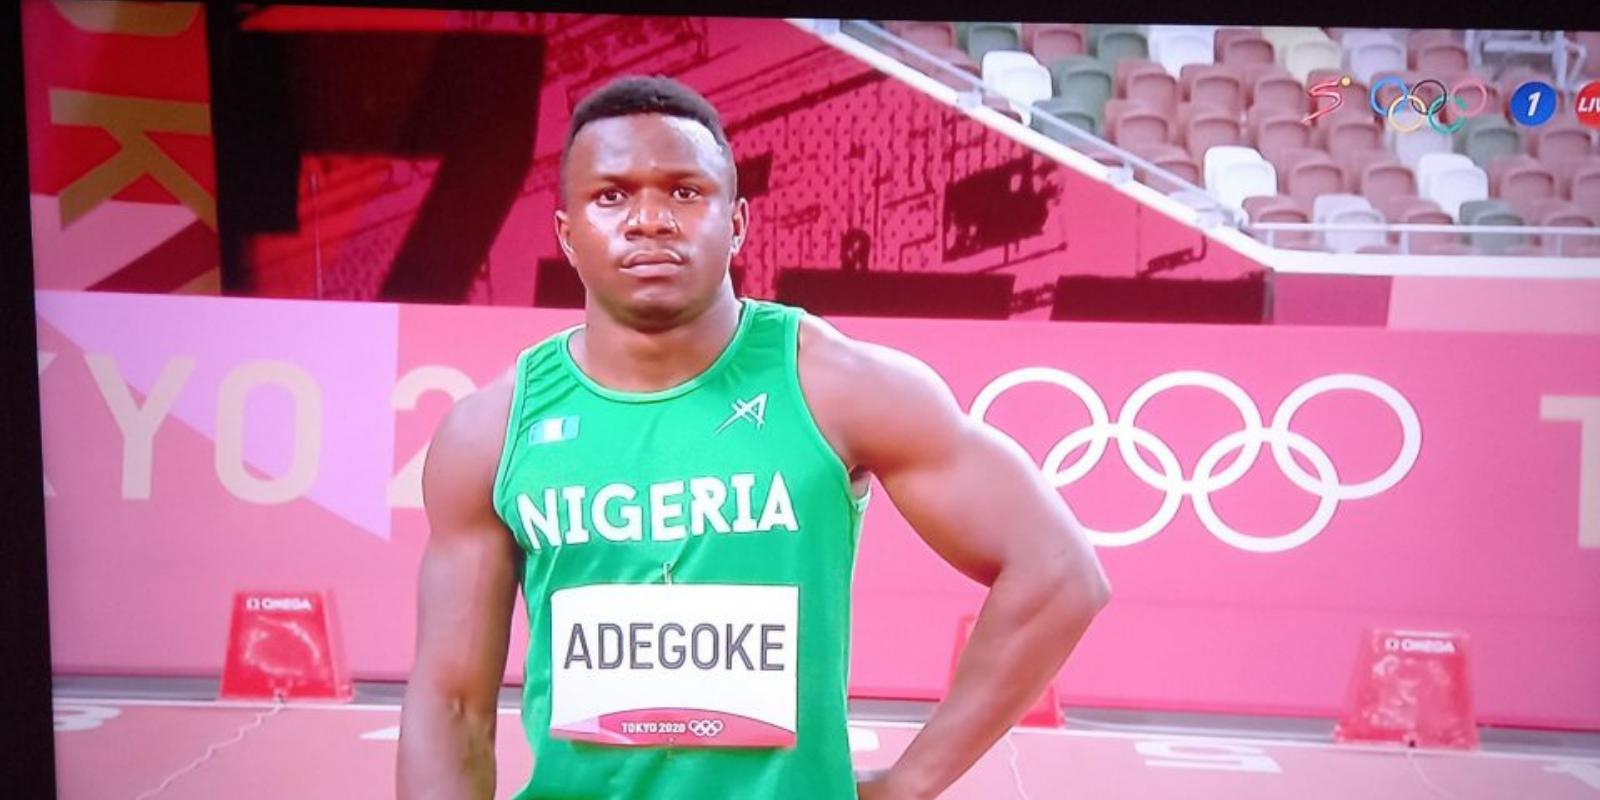 What sport does Enoch Adegoke participate in?